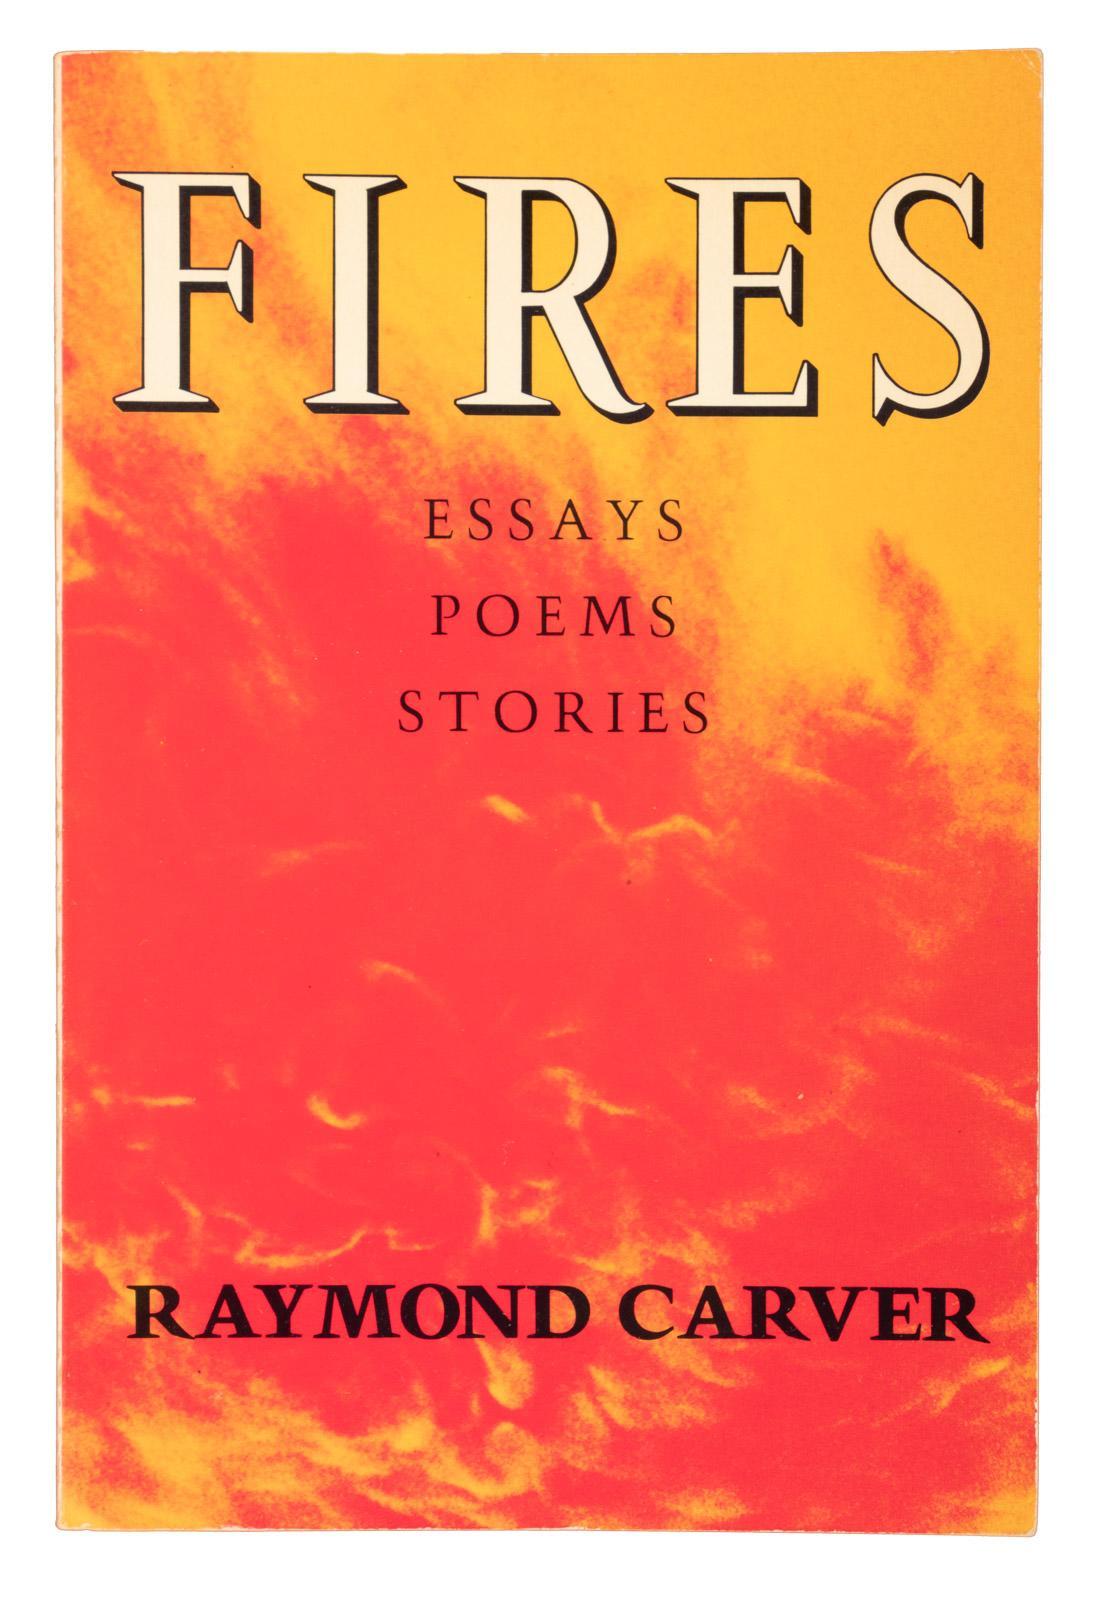 raymond carver fires essay pdf